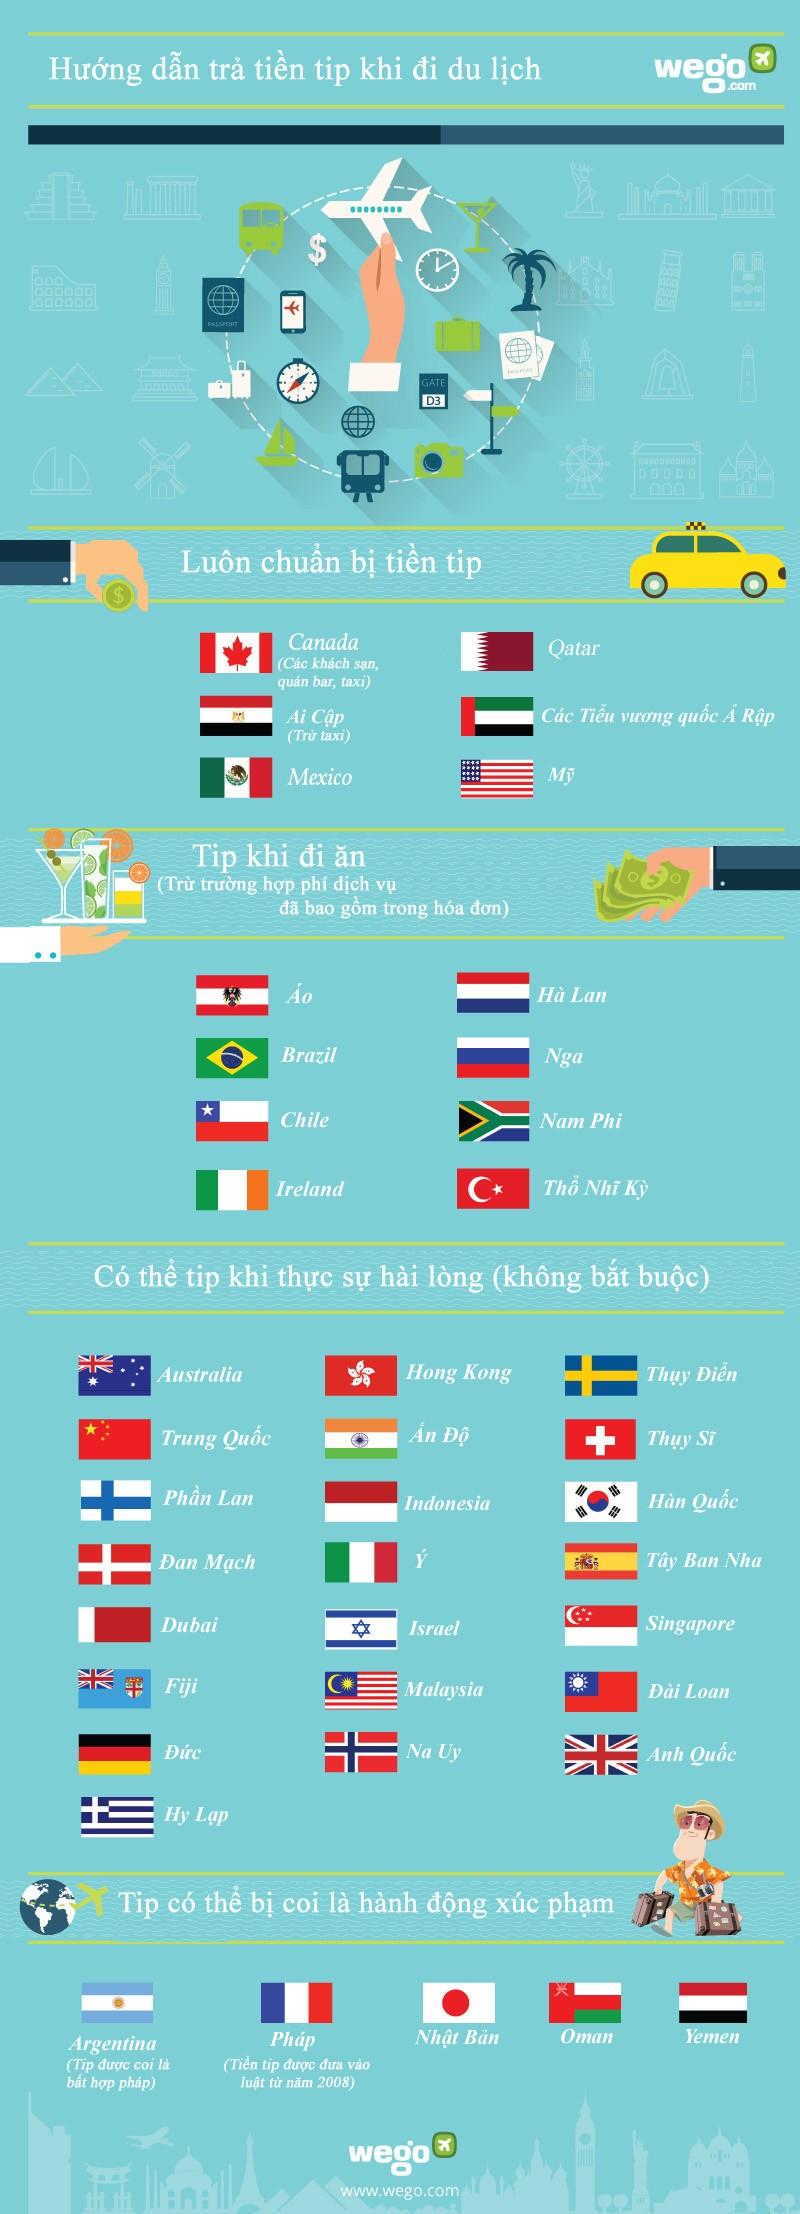 Wego-Where-To-Tip-Infographic-ivivu1